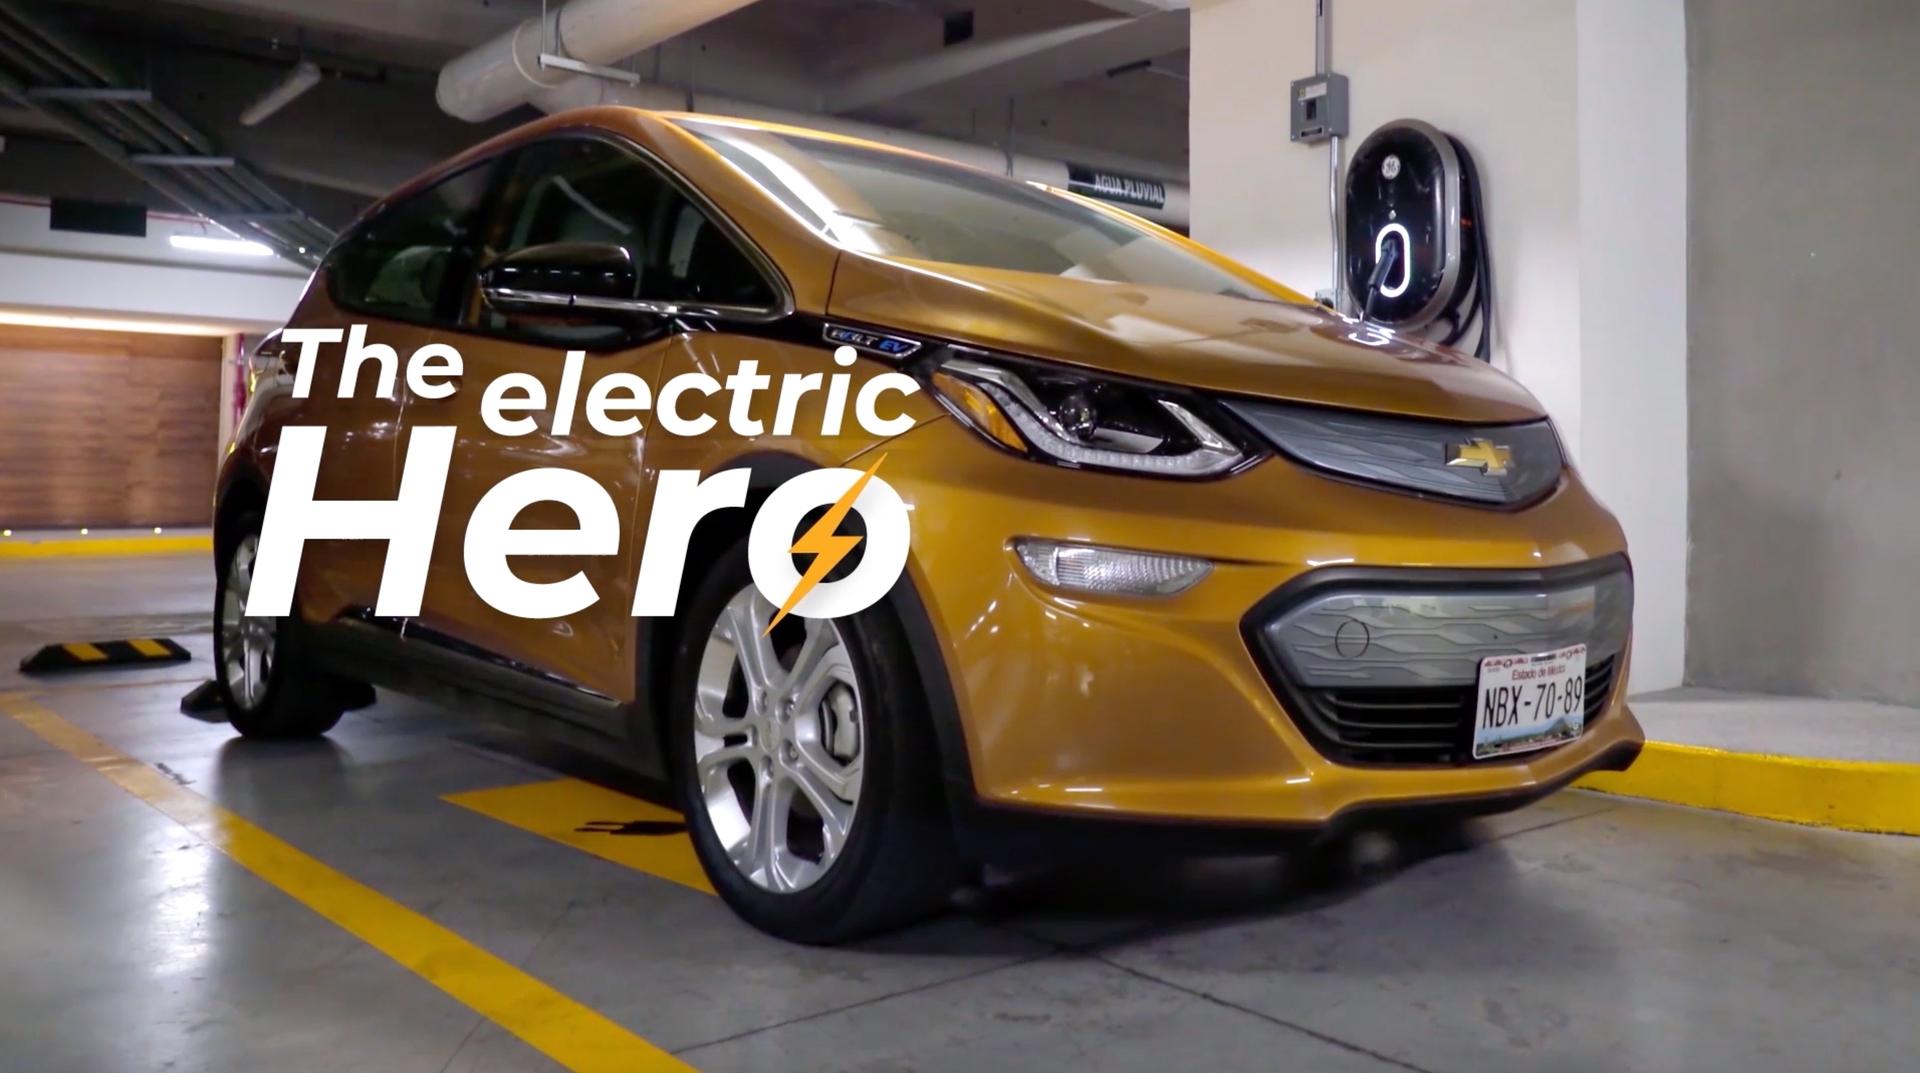 The electric hero